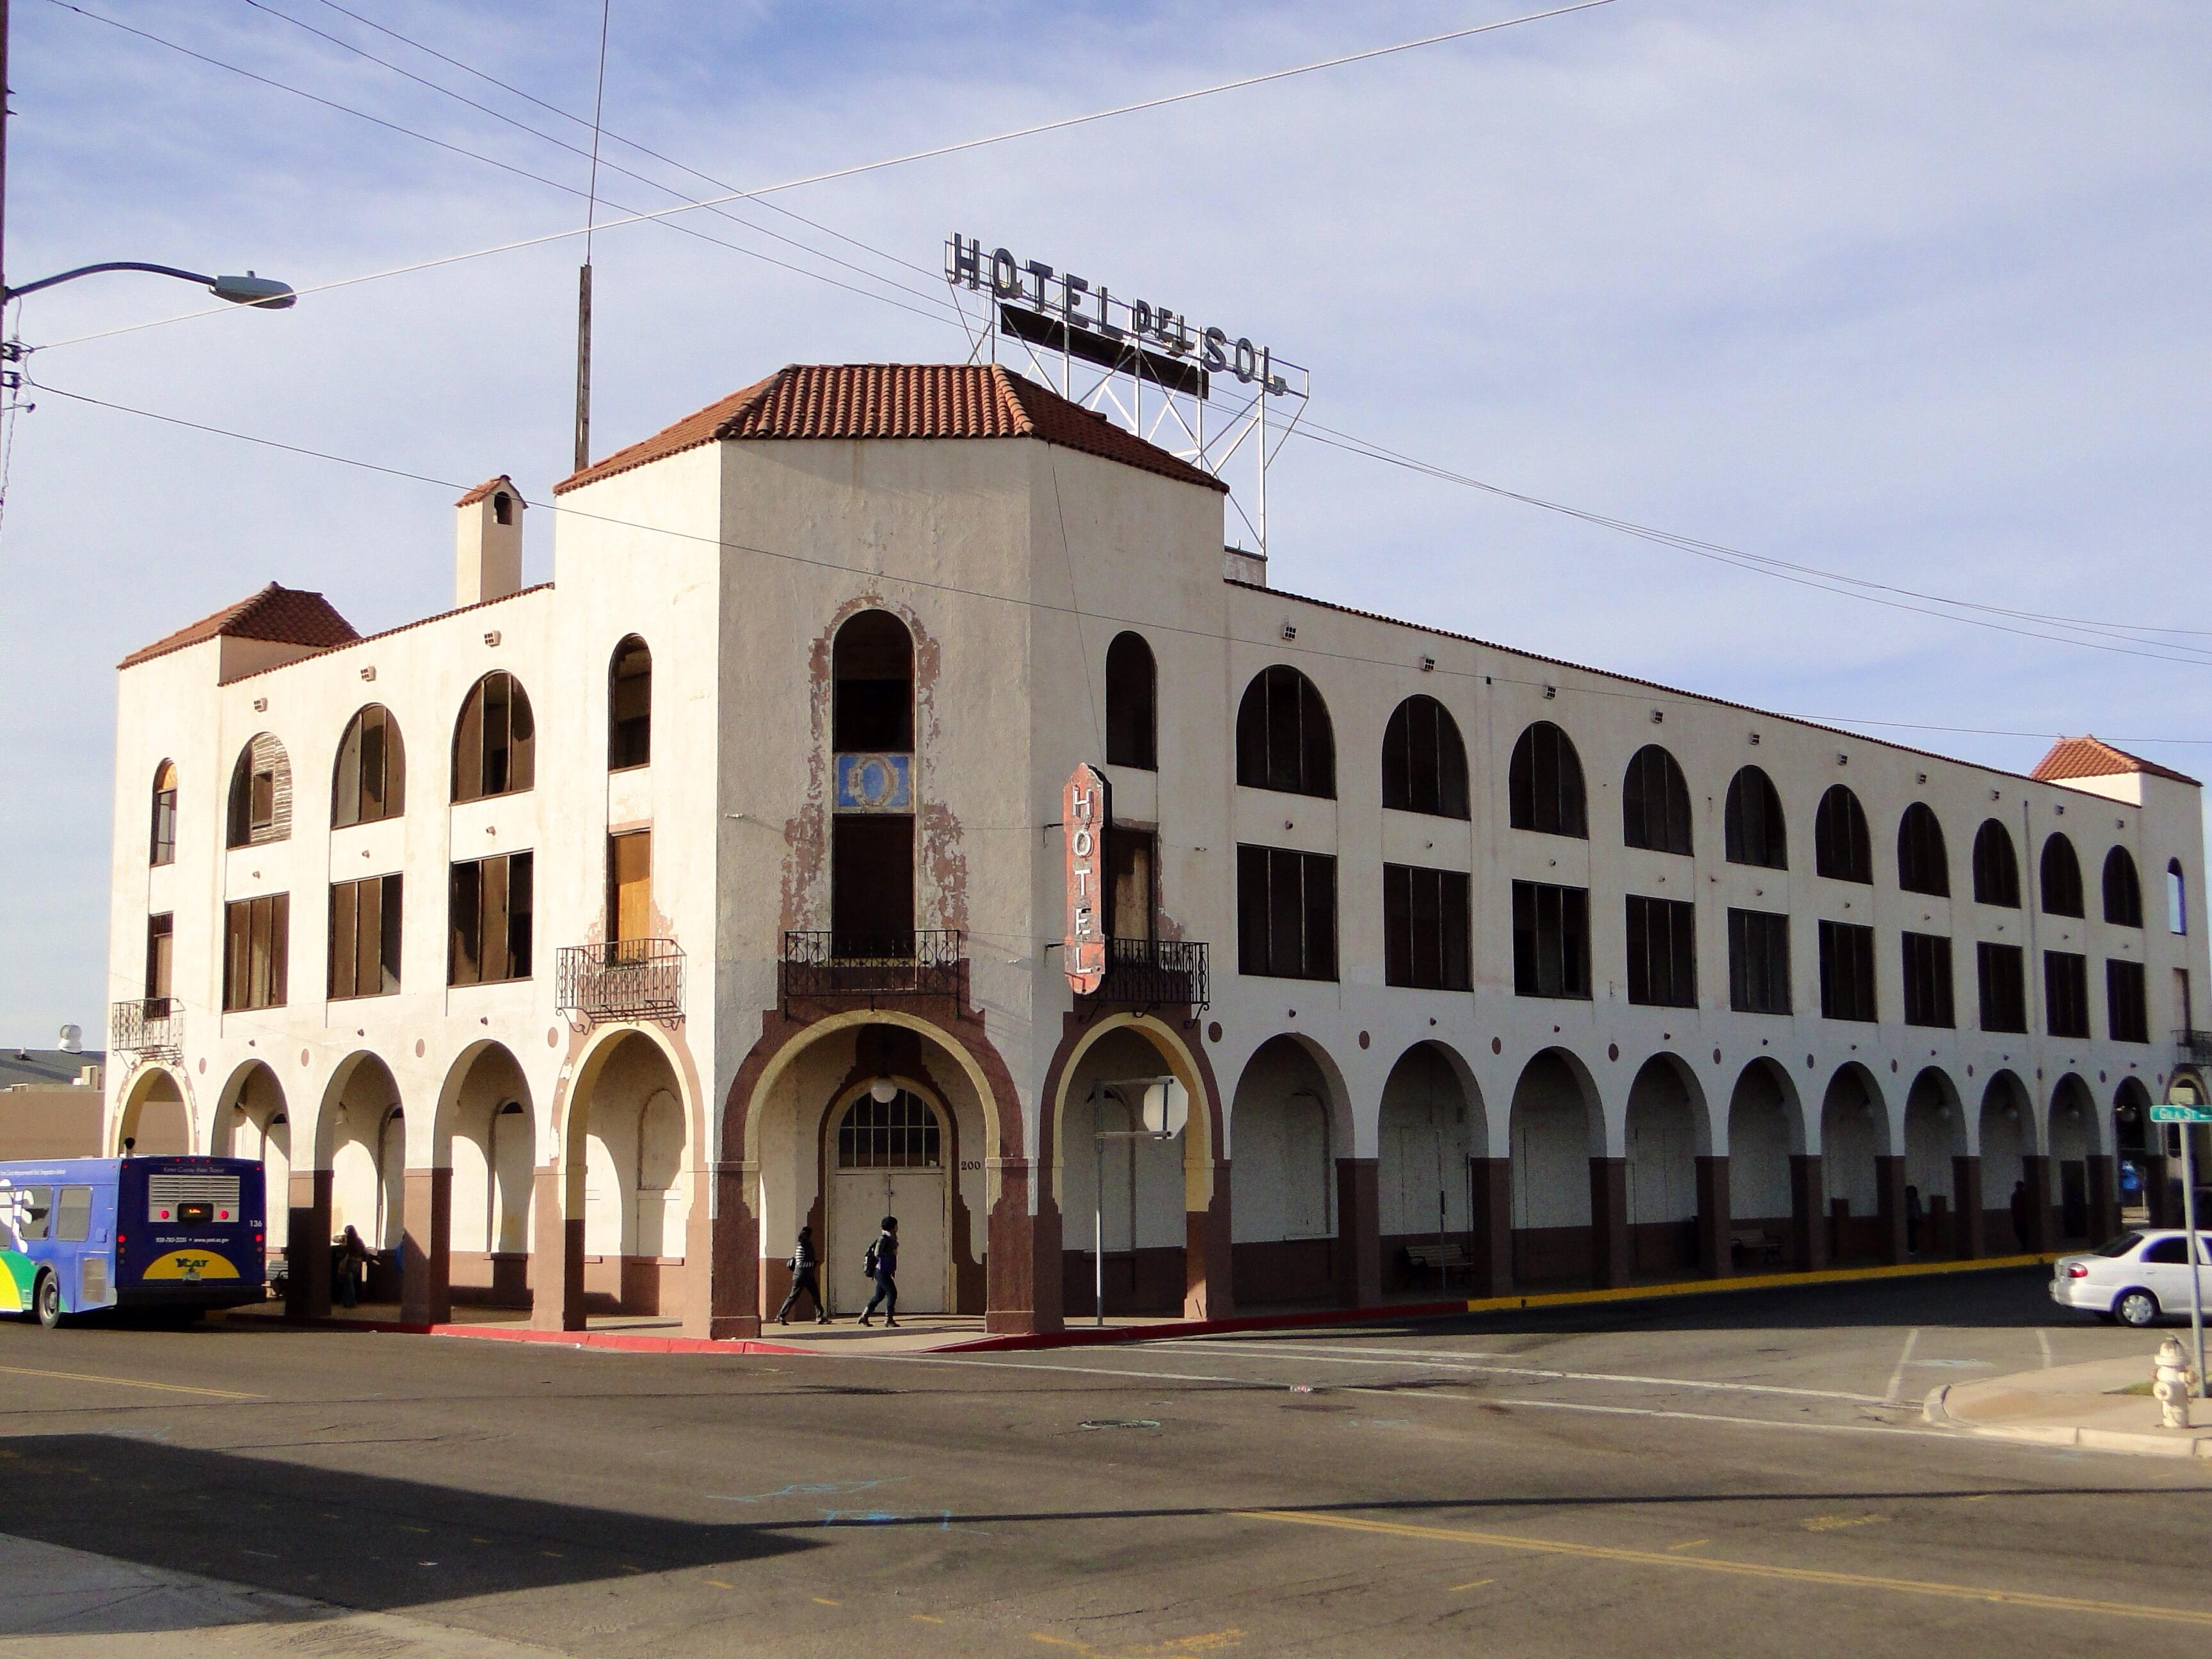 FileHotel del Ming  Hotel del Sol Yuma AZjpg